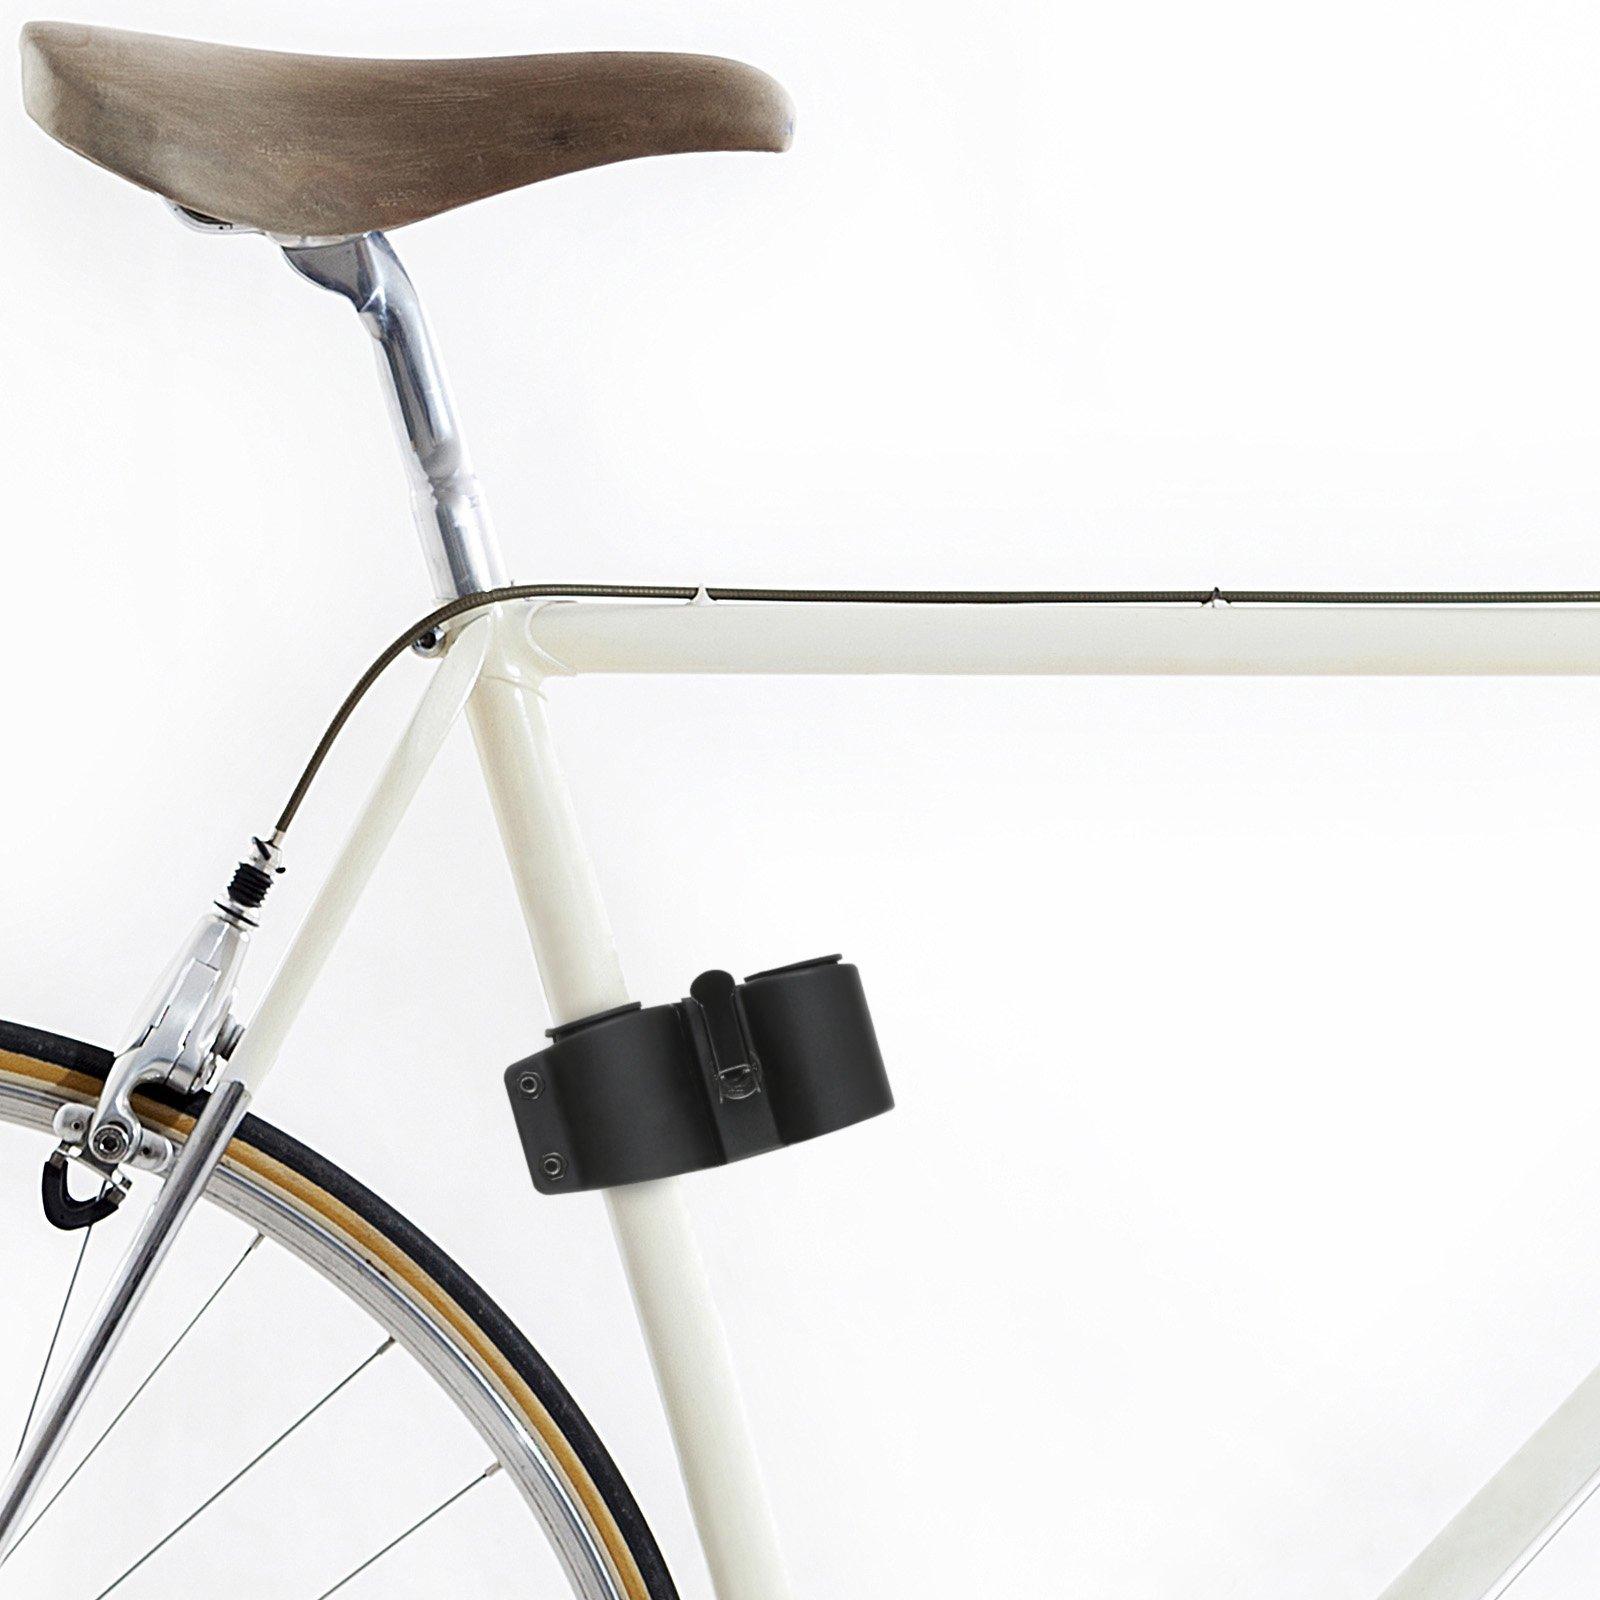 Soporte de candado de bicicleta, apto para candados tipo D/U ...